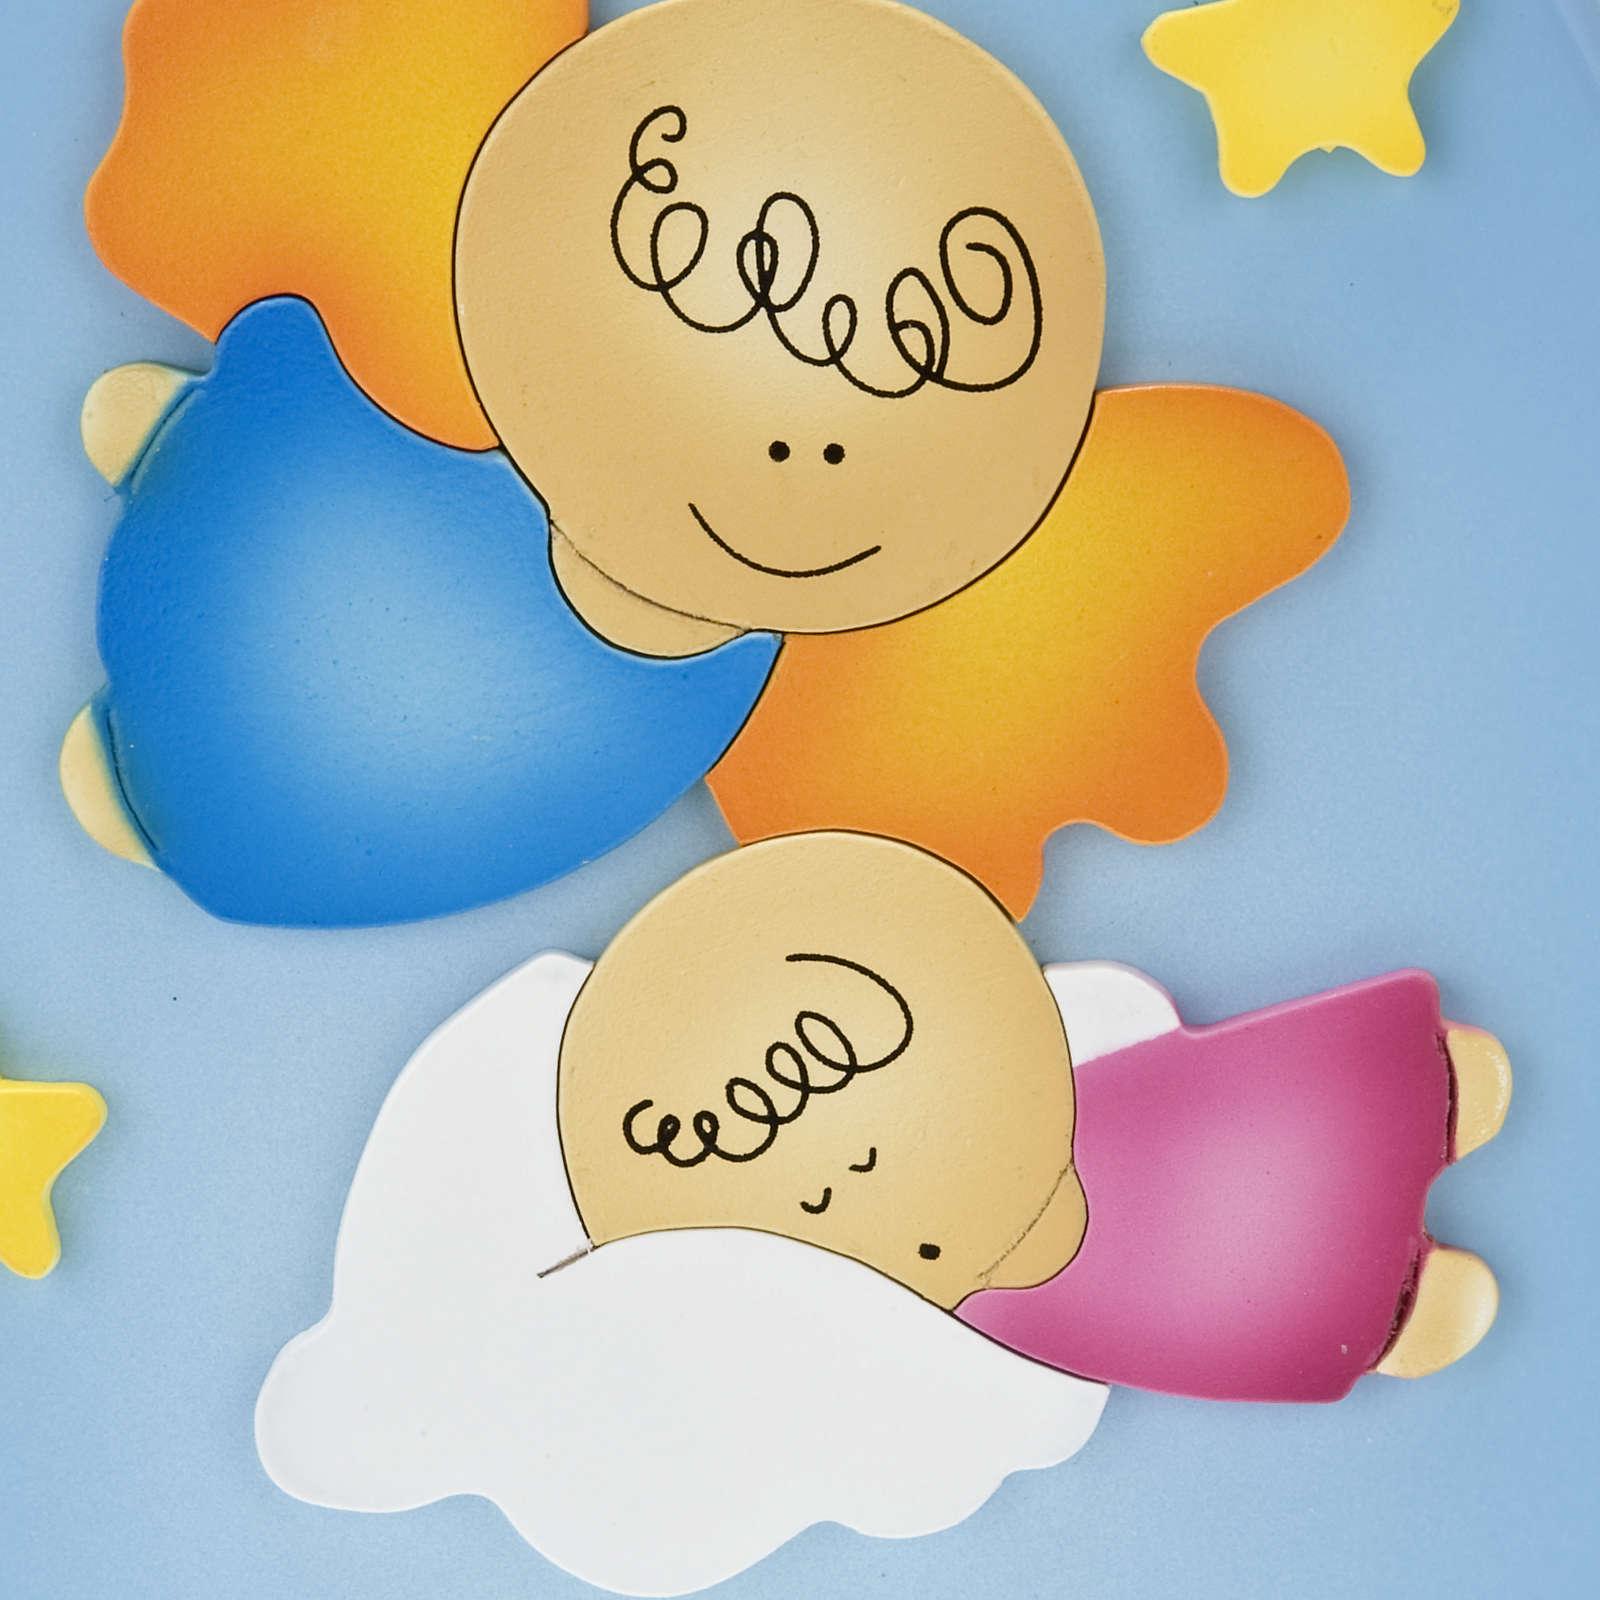 Pala bassorilievo angelo con bimbo che dorme ovale 4